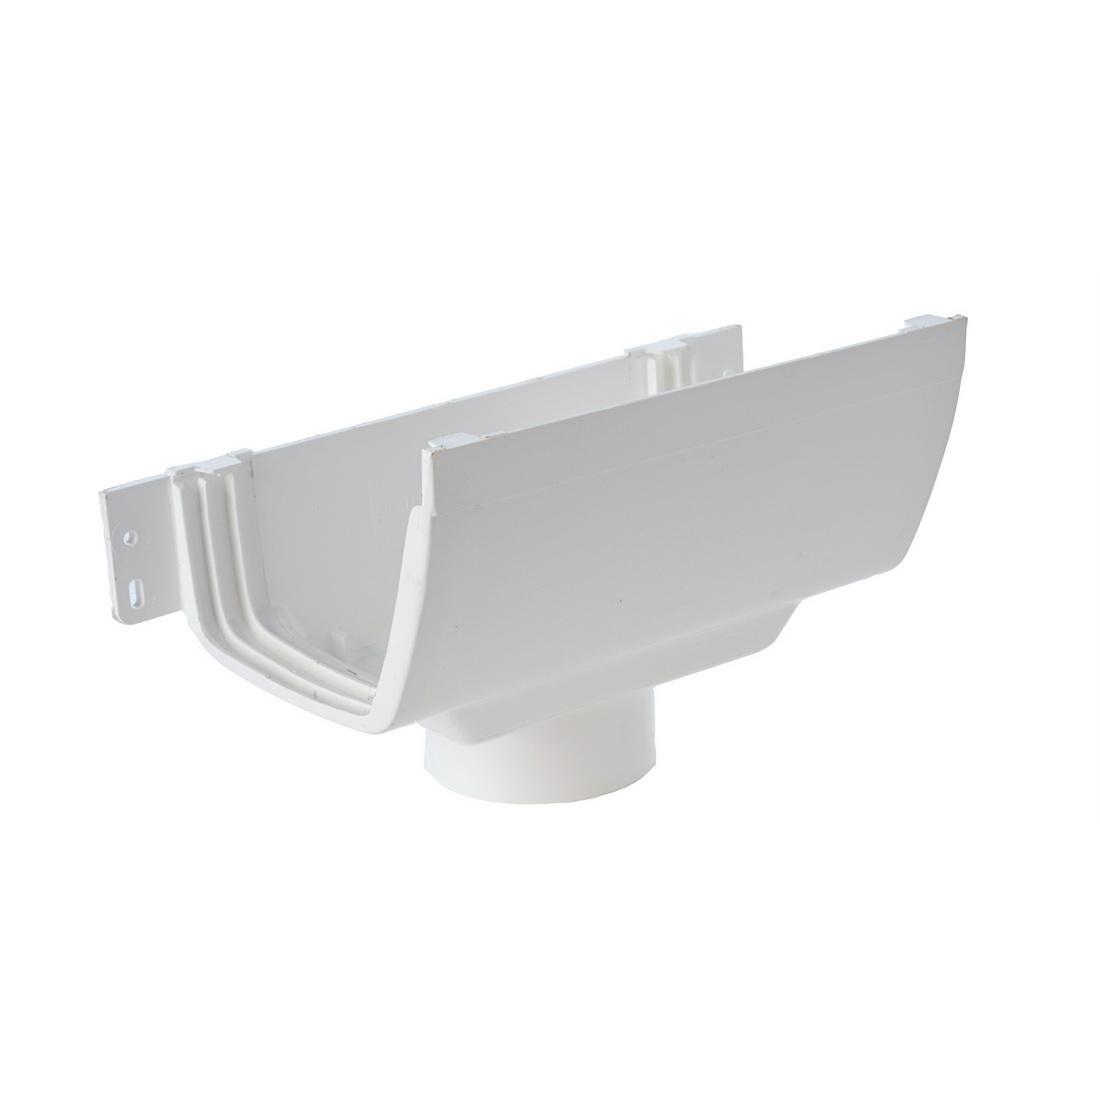 Marley Flowline Expansion Outlet 80 mm White FL8.80